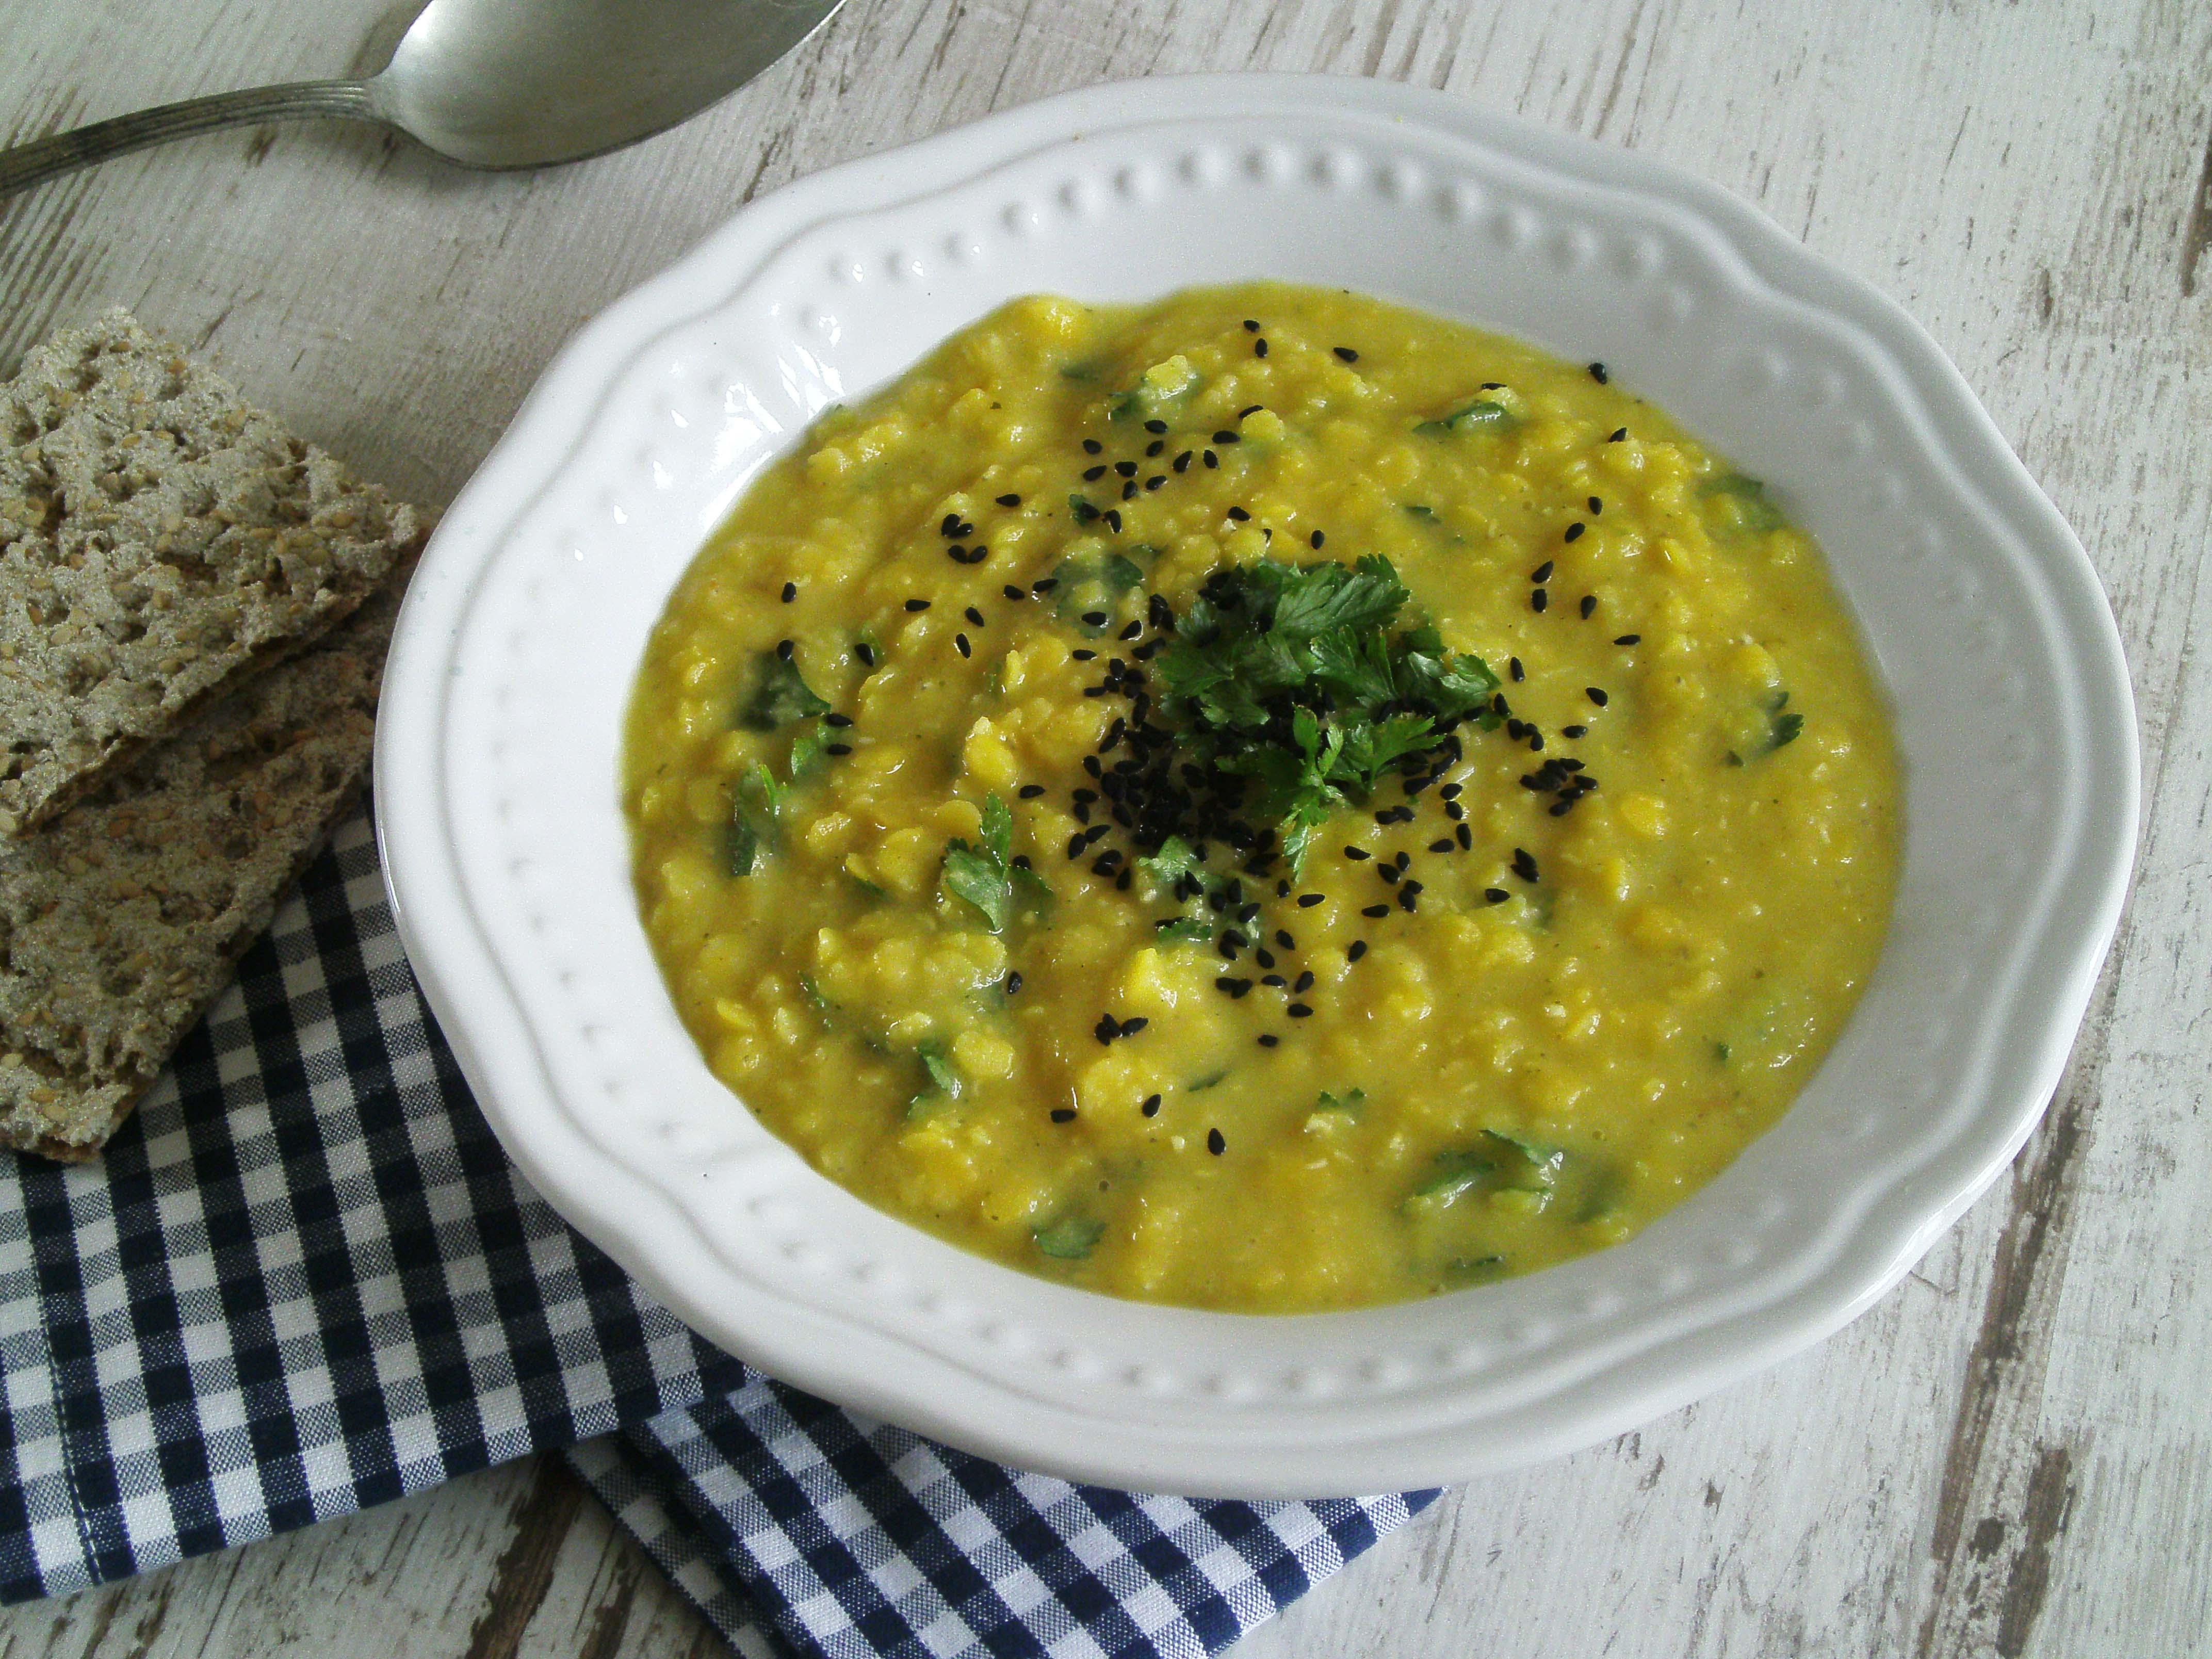 Rezepte - Suppen & Eintopf - gelbe Linsensuppe - glutenfrei, vollwertig & clean eating